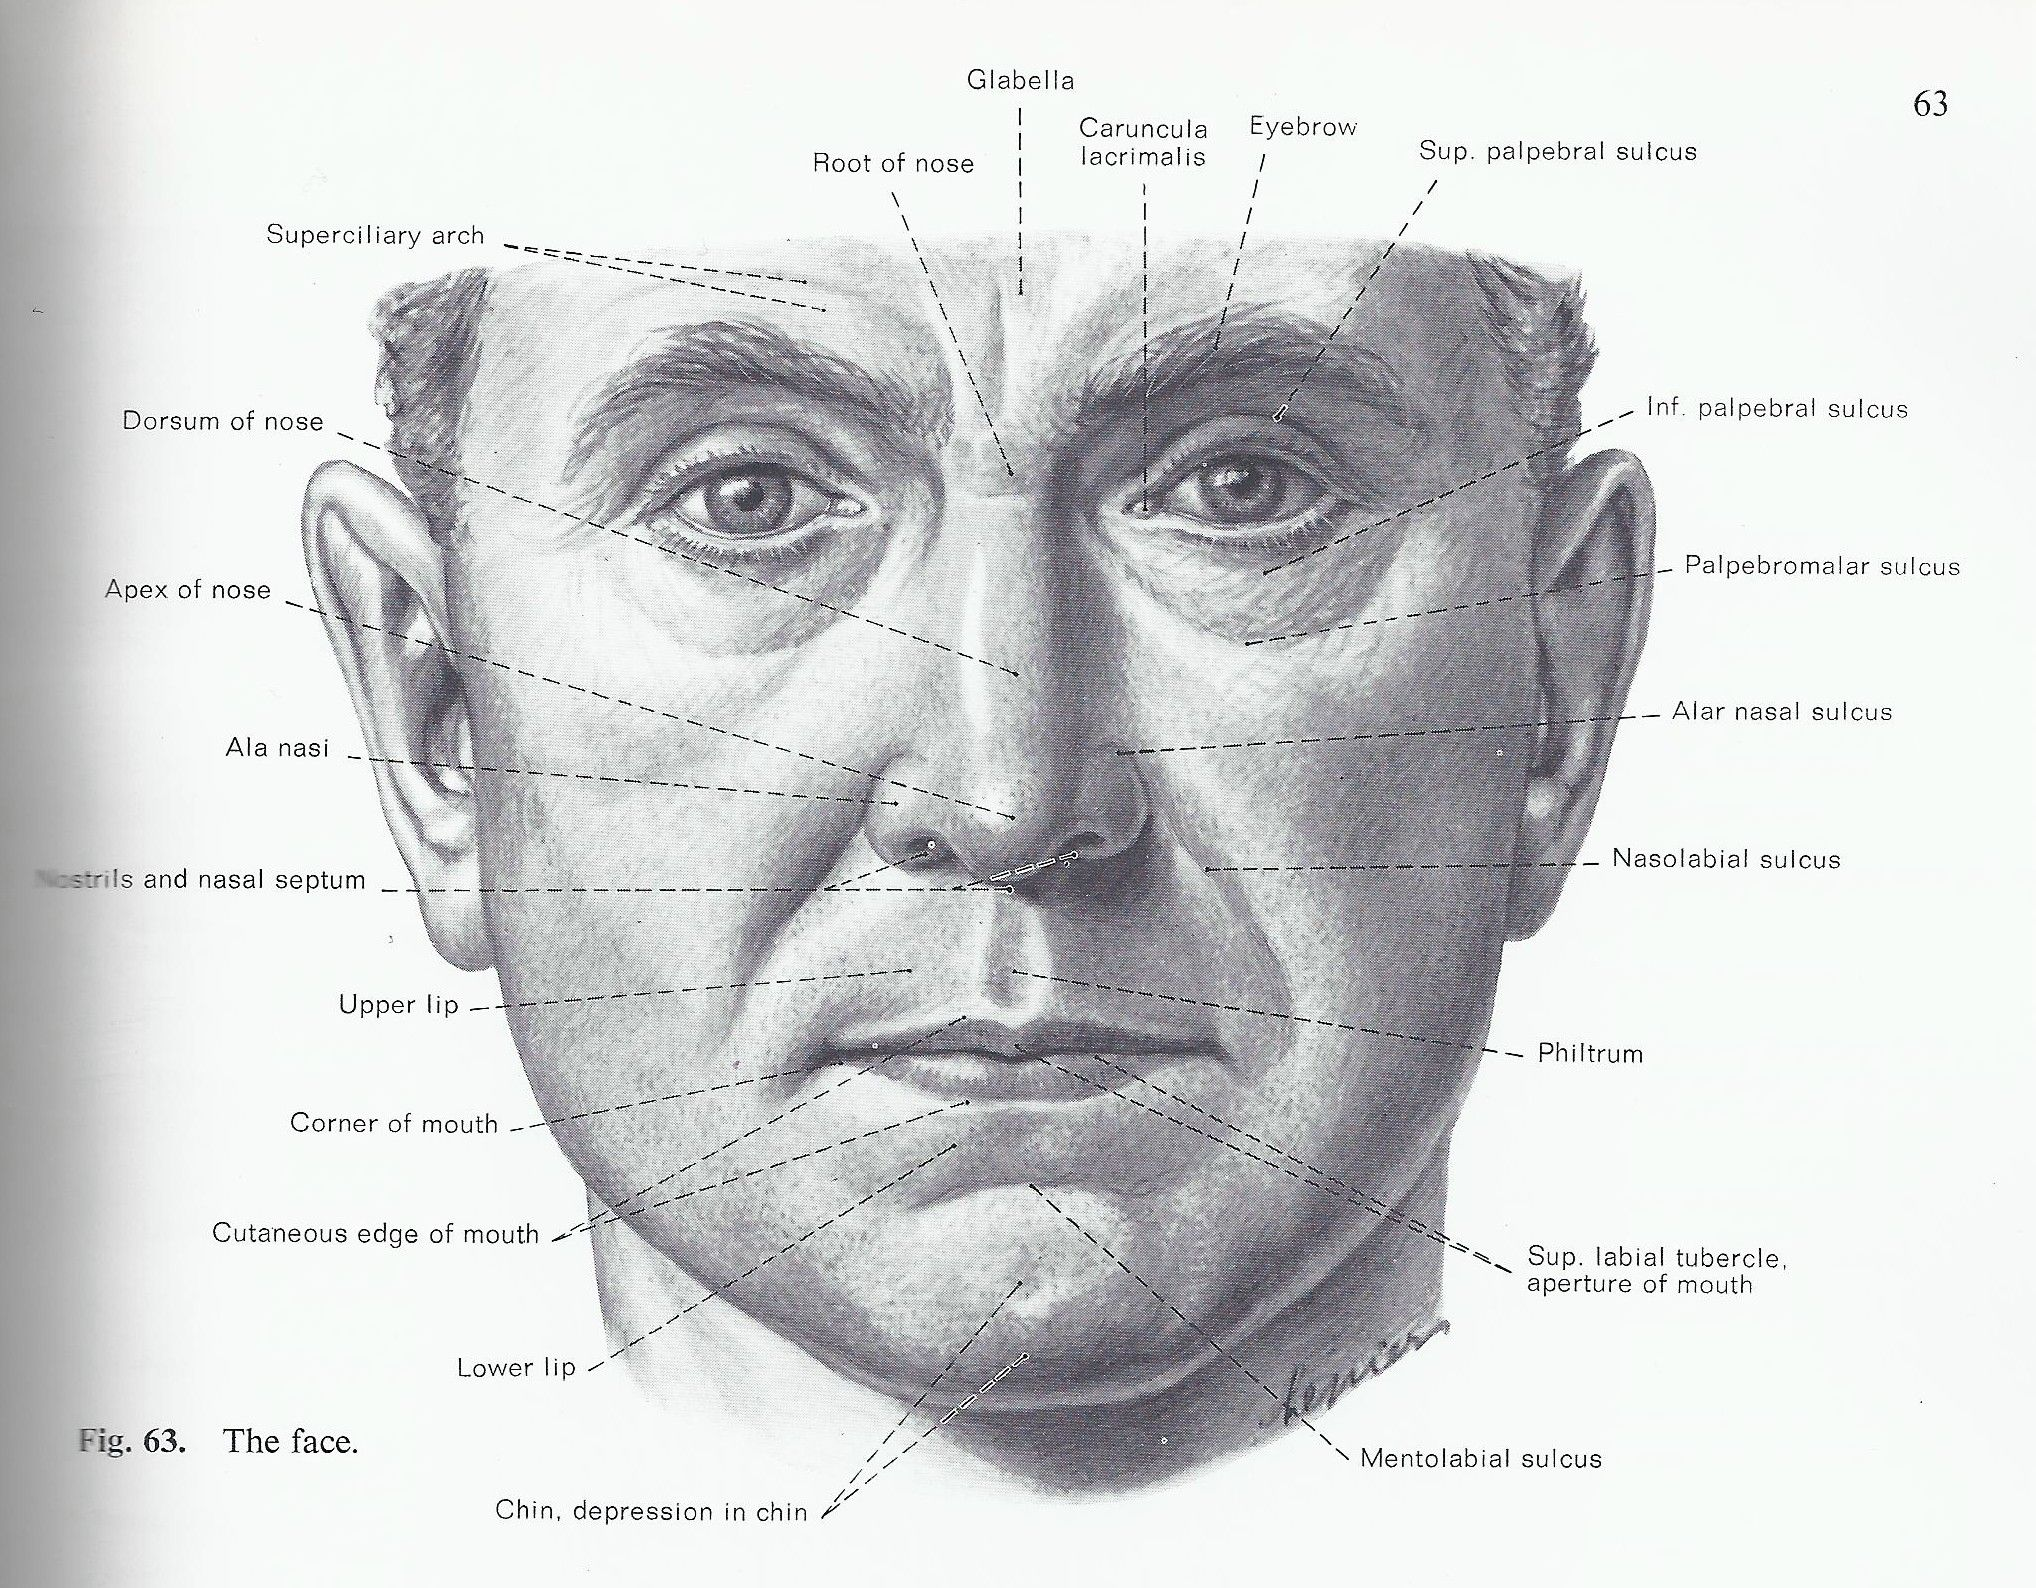 Non-surgical Rhinoplasty - Aesthetics |External Lip Anatomy